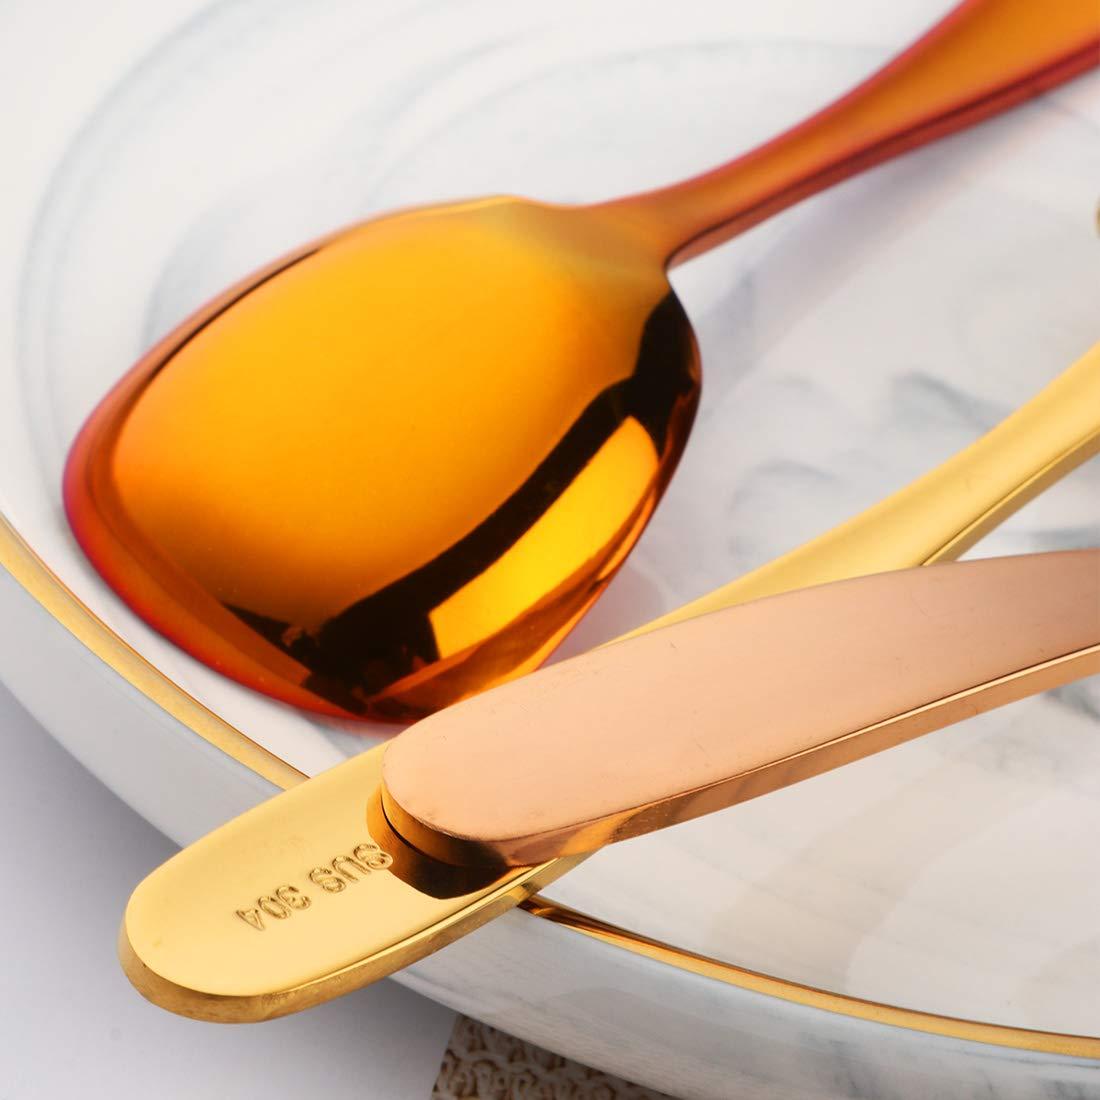 Coffee Spoons//Dessert Spoons Coloured Do Buy Teaspoons Set of 8 5.5inch//14cm